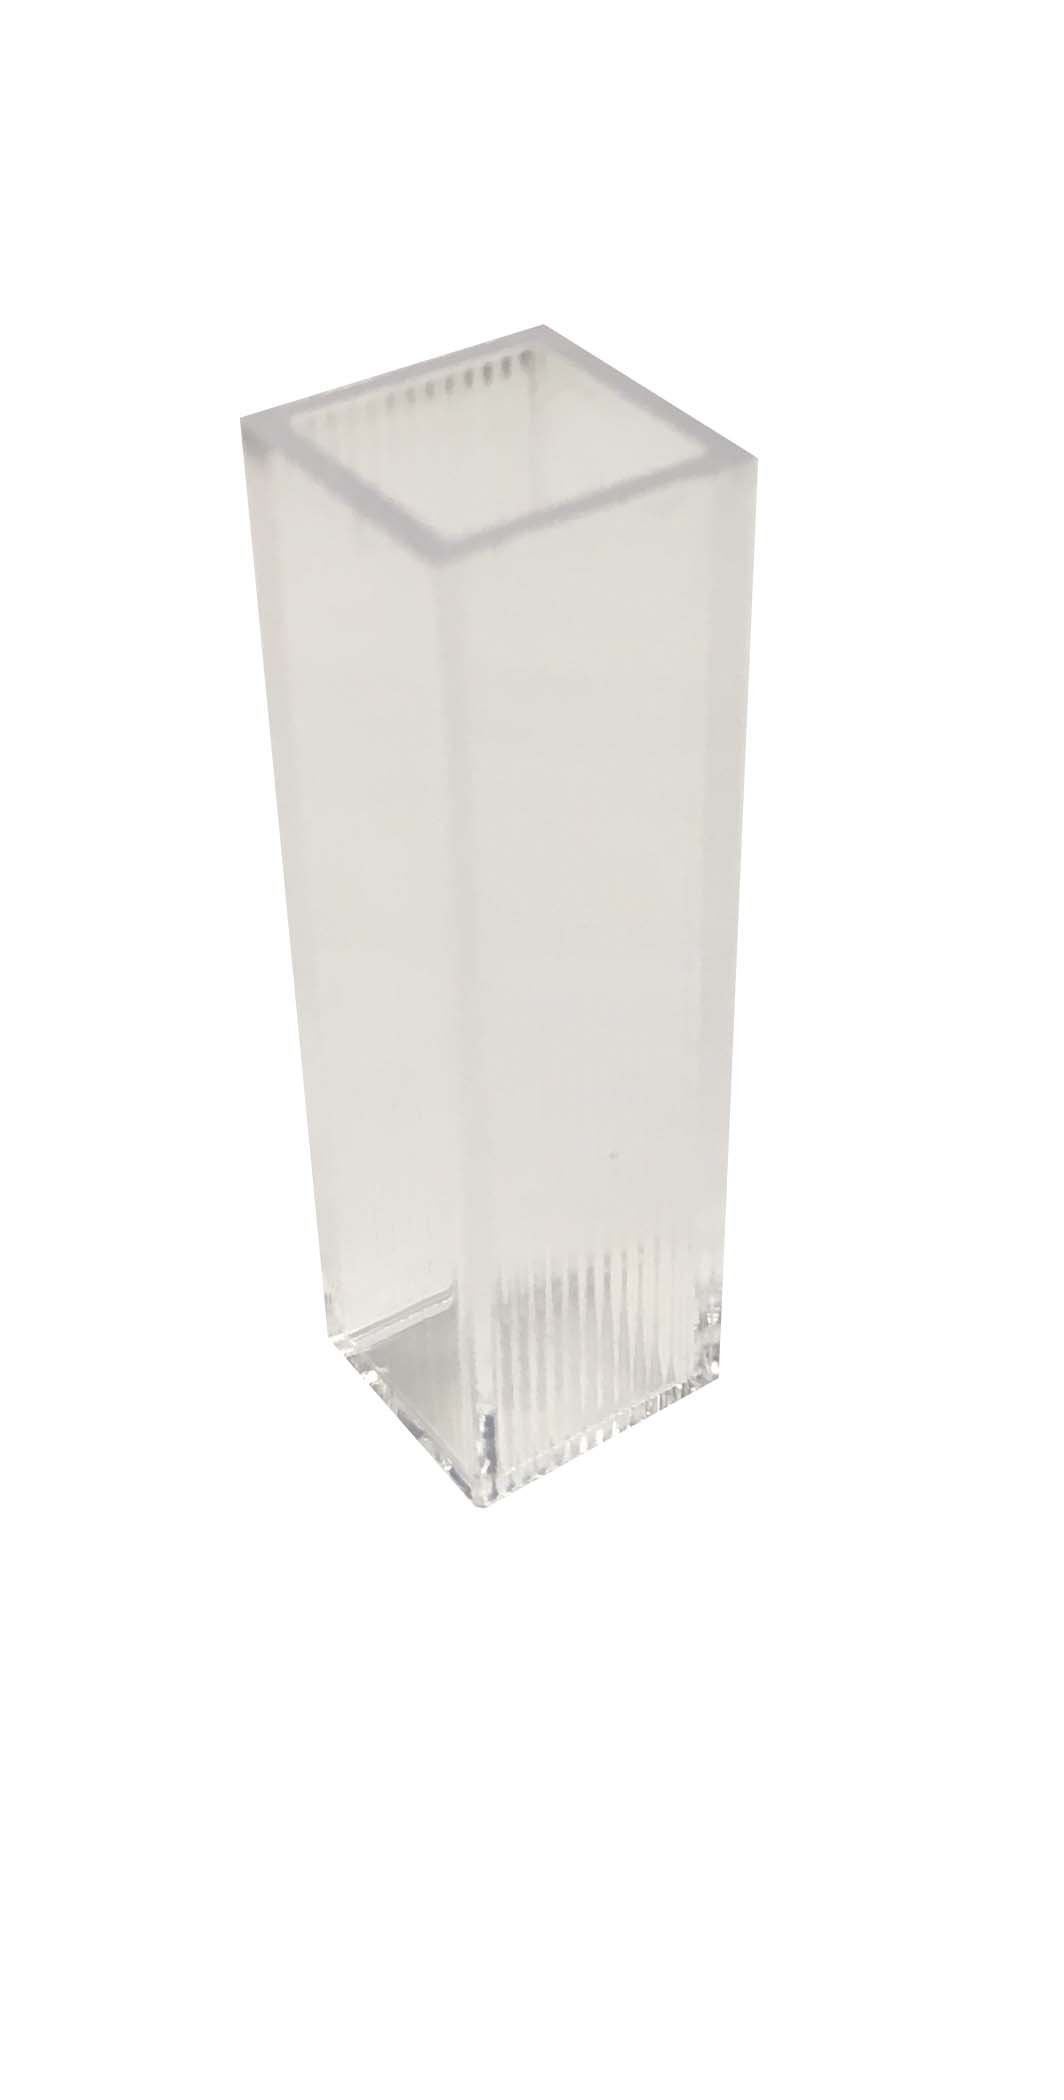 Disposable Plastic Cuvette, Fluorimeter, 10 mm Pathlength, 3.5 ml, 1000 per Case